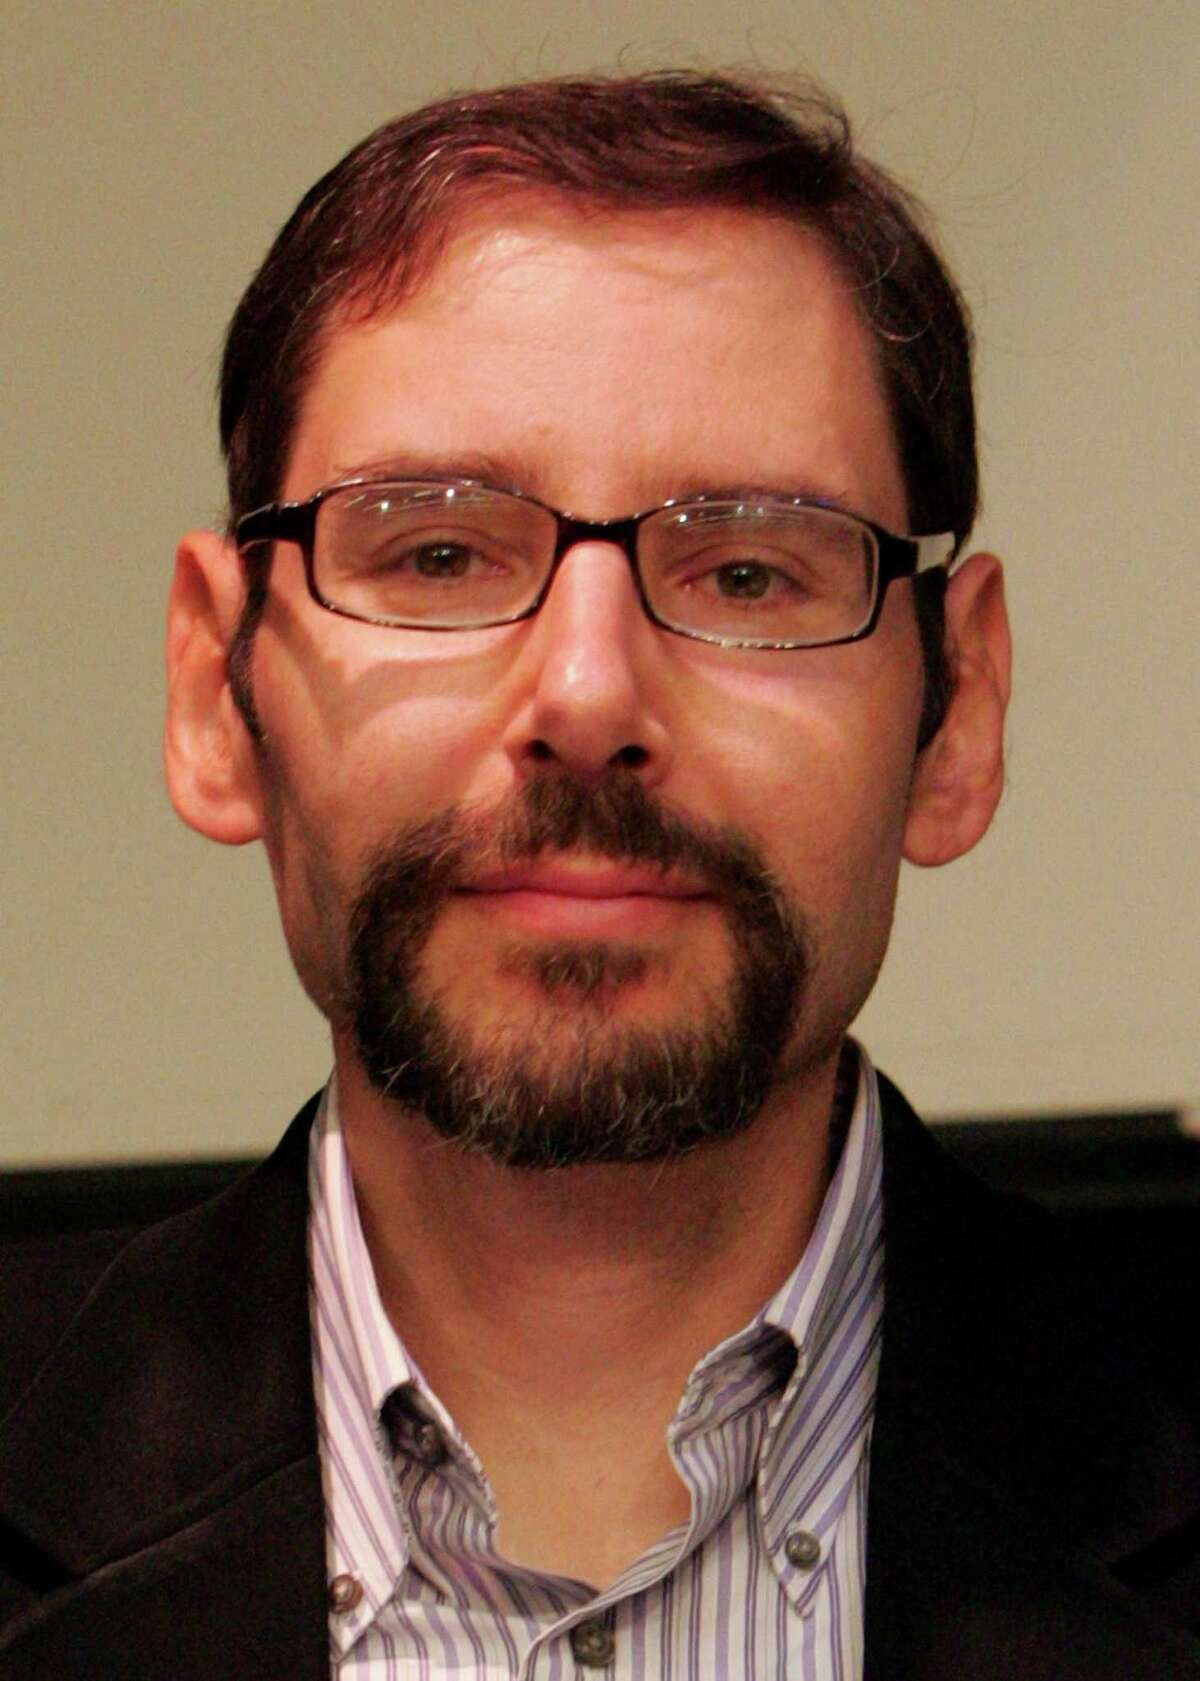 Rolf Maurer, Stamford Board of Education candidate